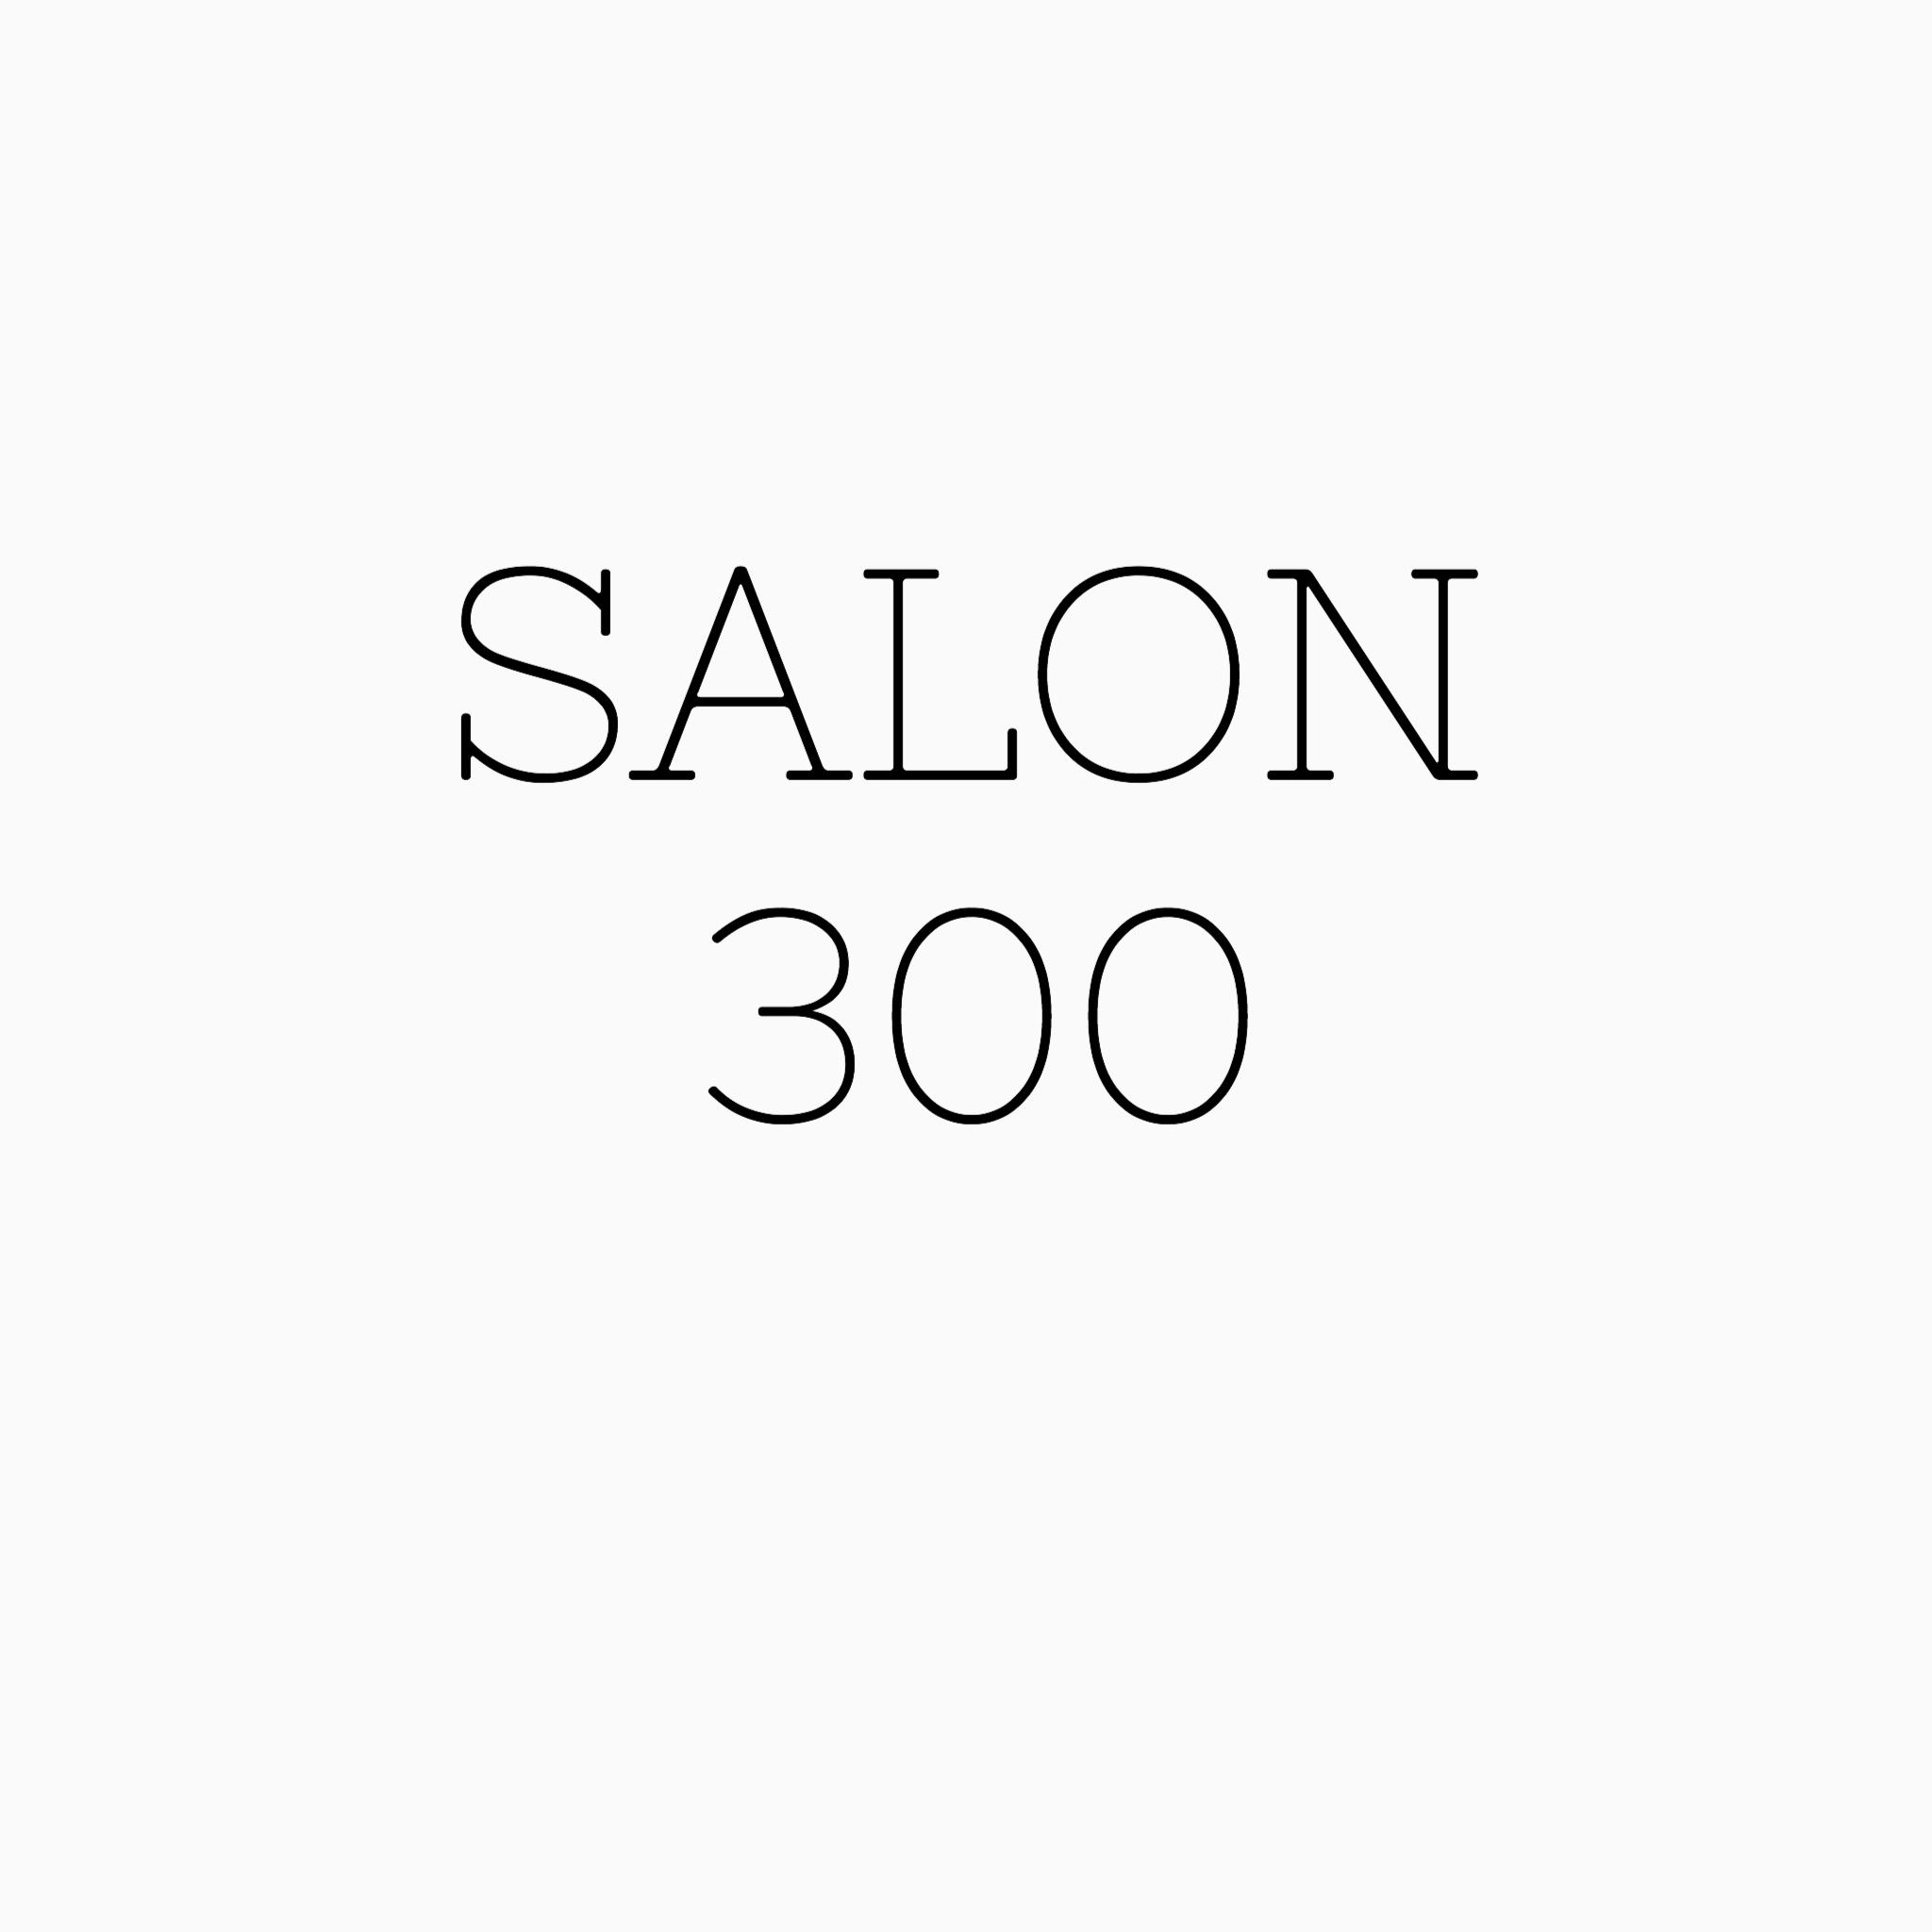 Salon Spa 300